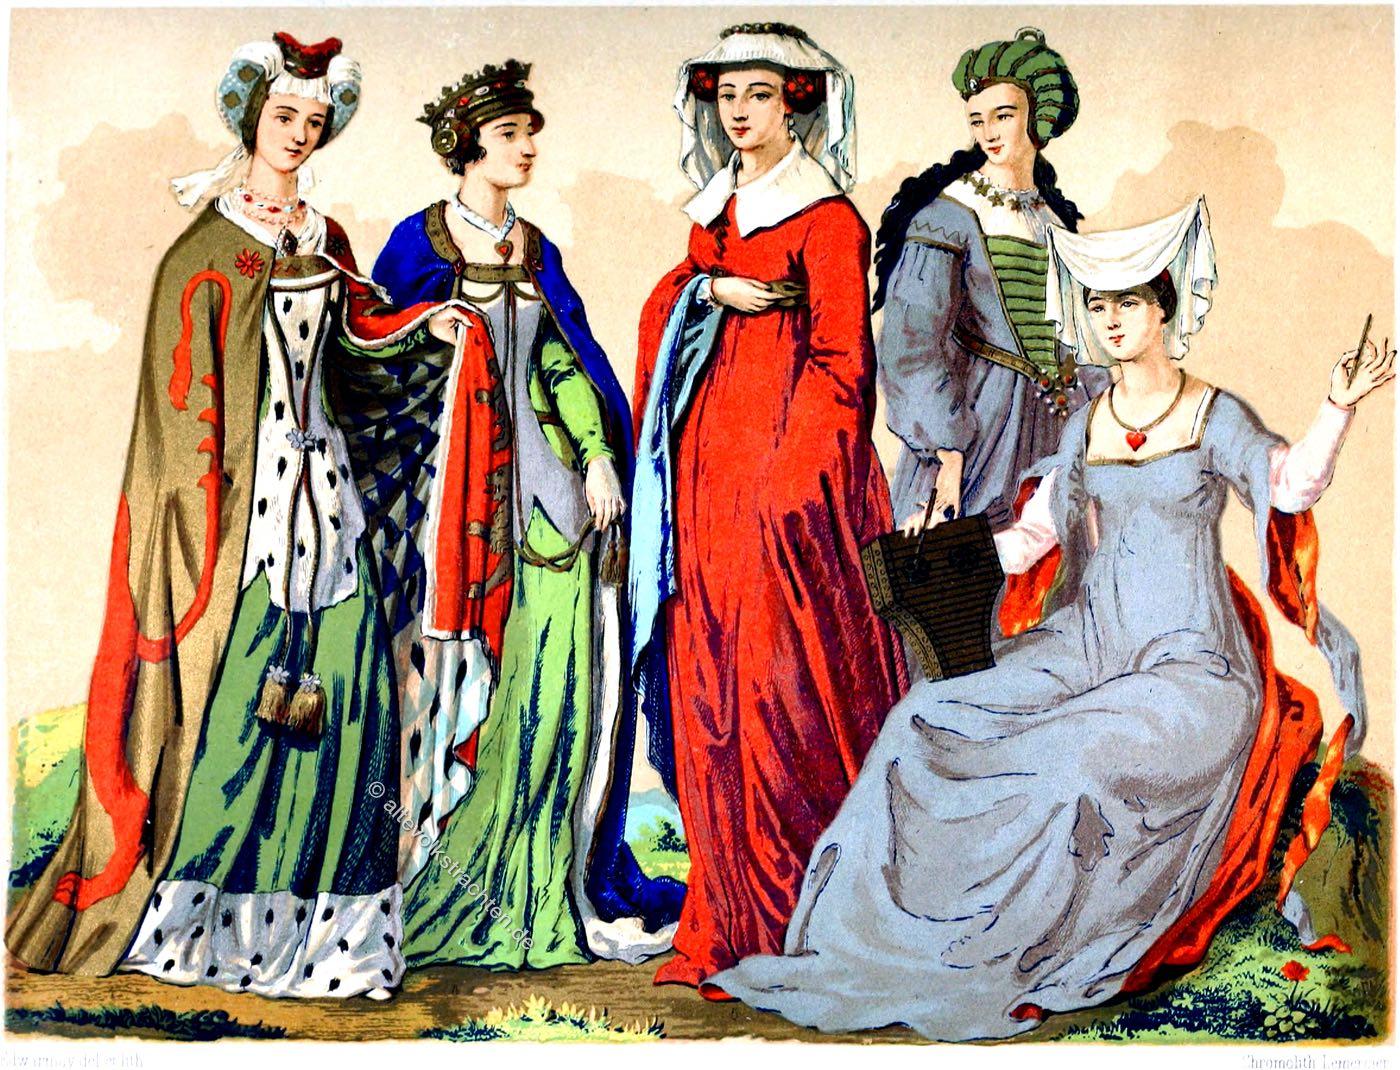 Mode, Edeldamen, England, Renaissance, Kostüme, Hennin, Mittelalter